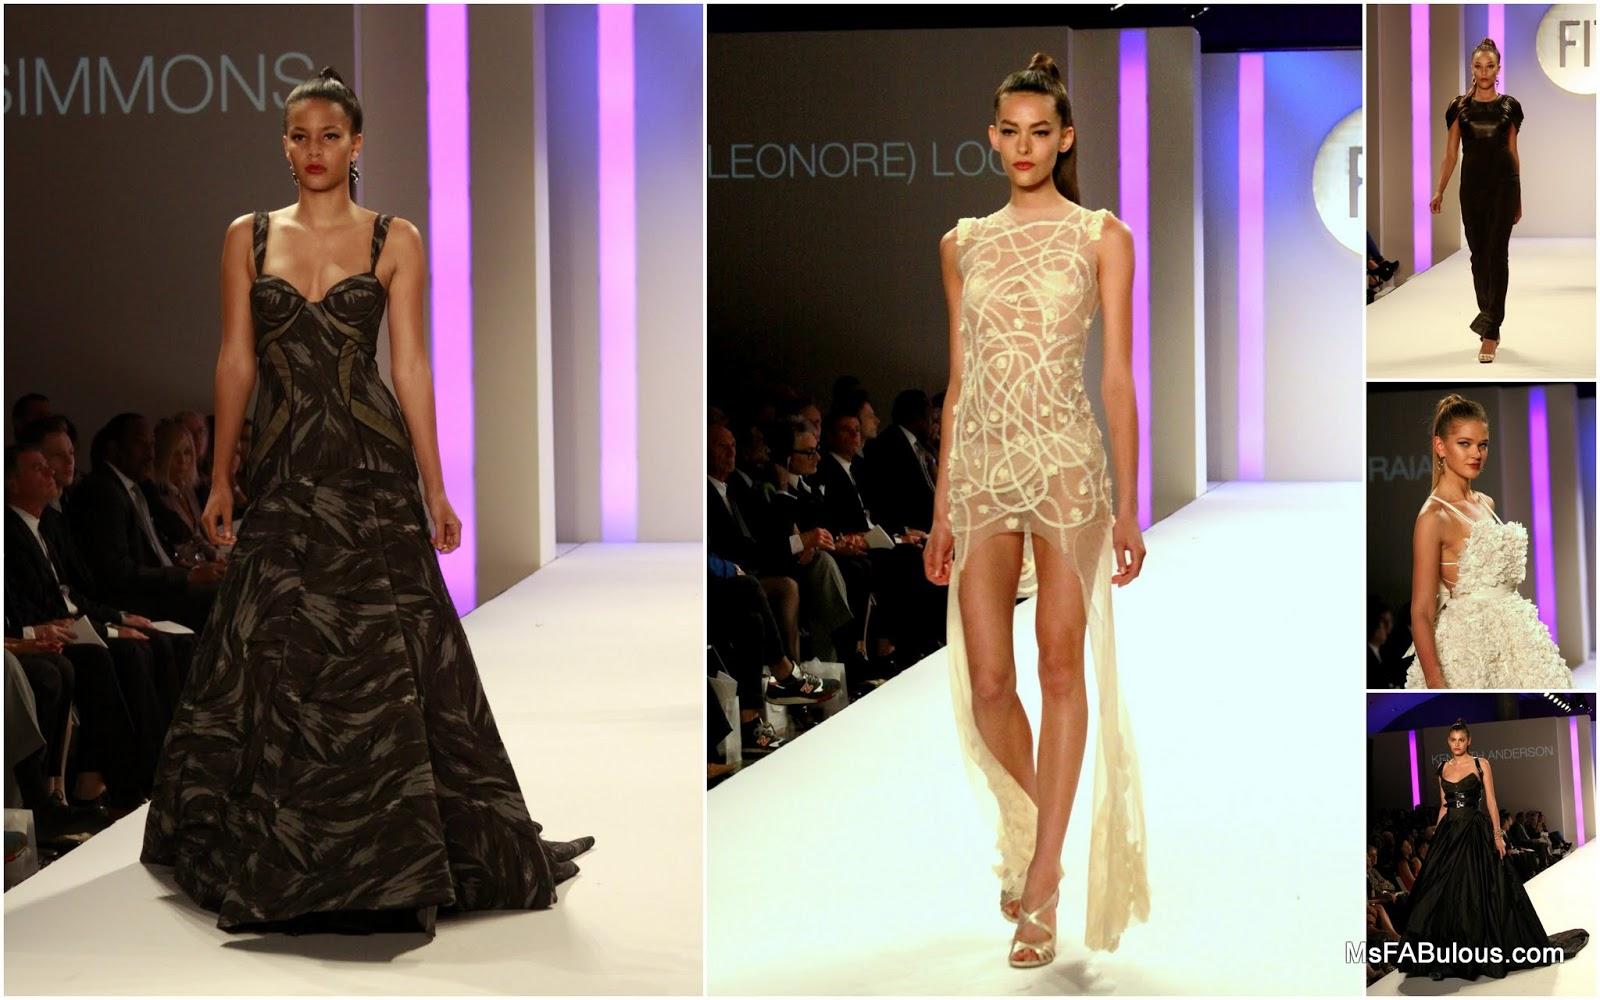 MS. FABULOUS: FIT Fashion Show 2013